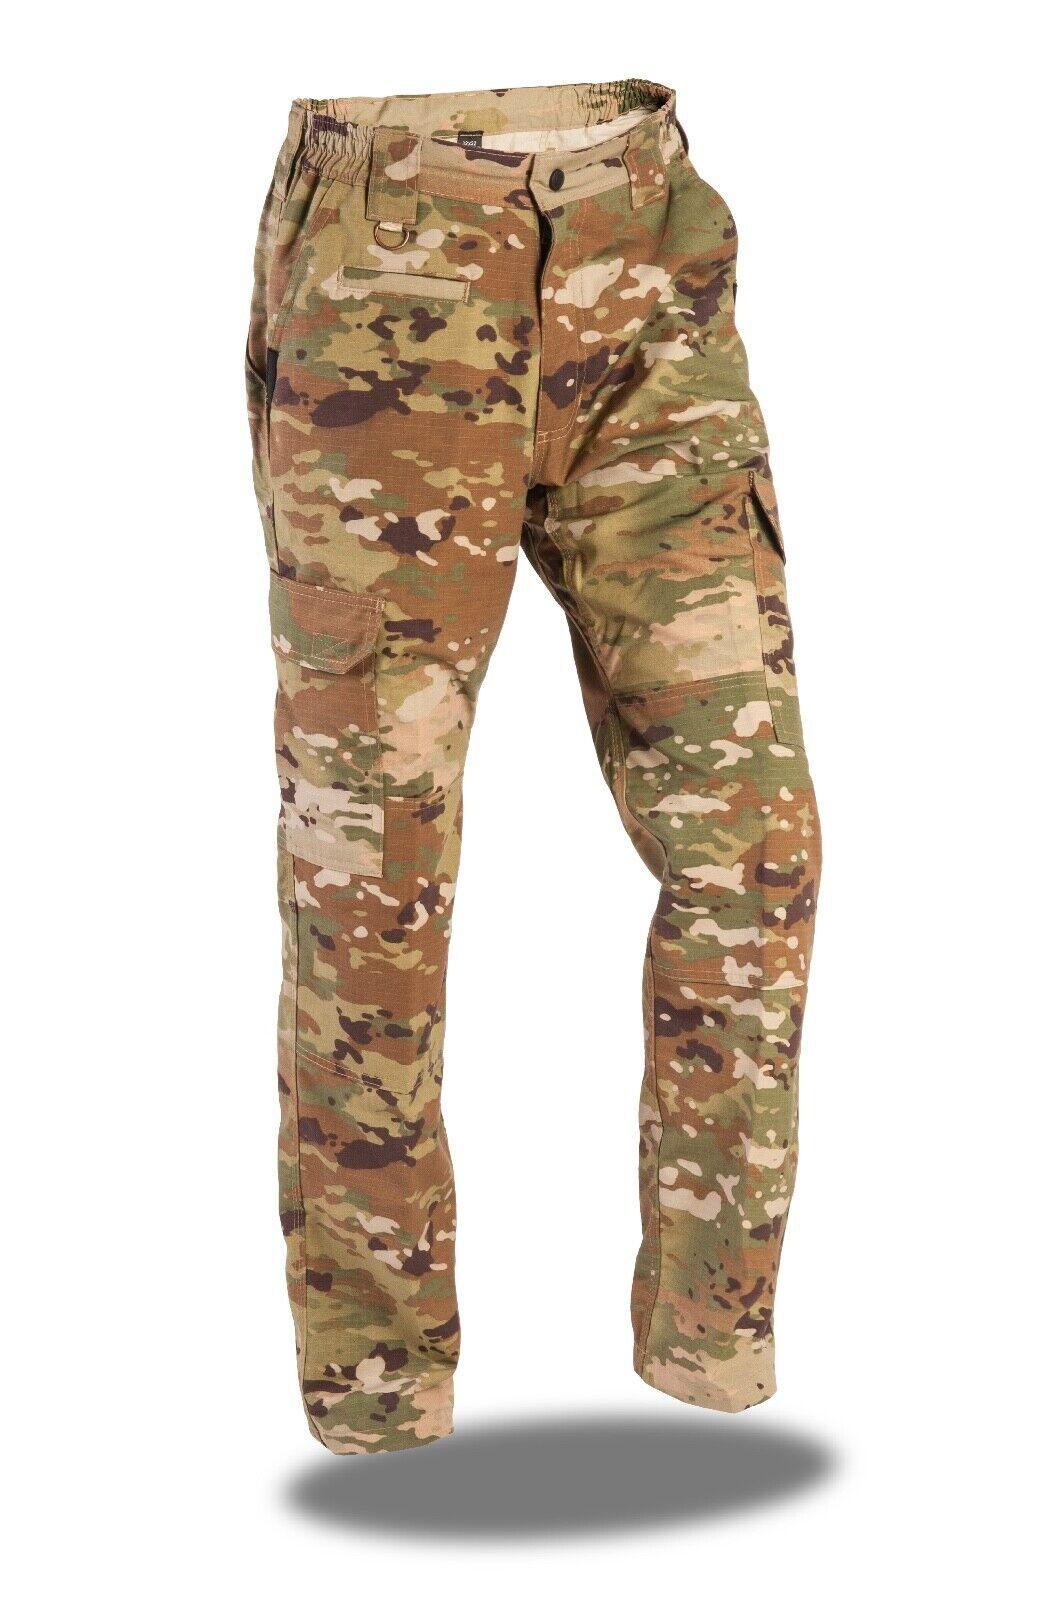 1651 Herren Scorpion Ocp Camo Armee Combat Tactical Duty Uniform Hose